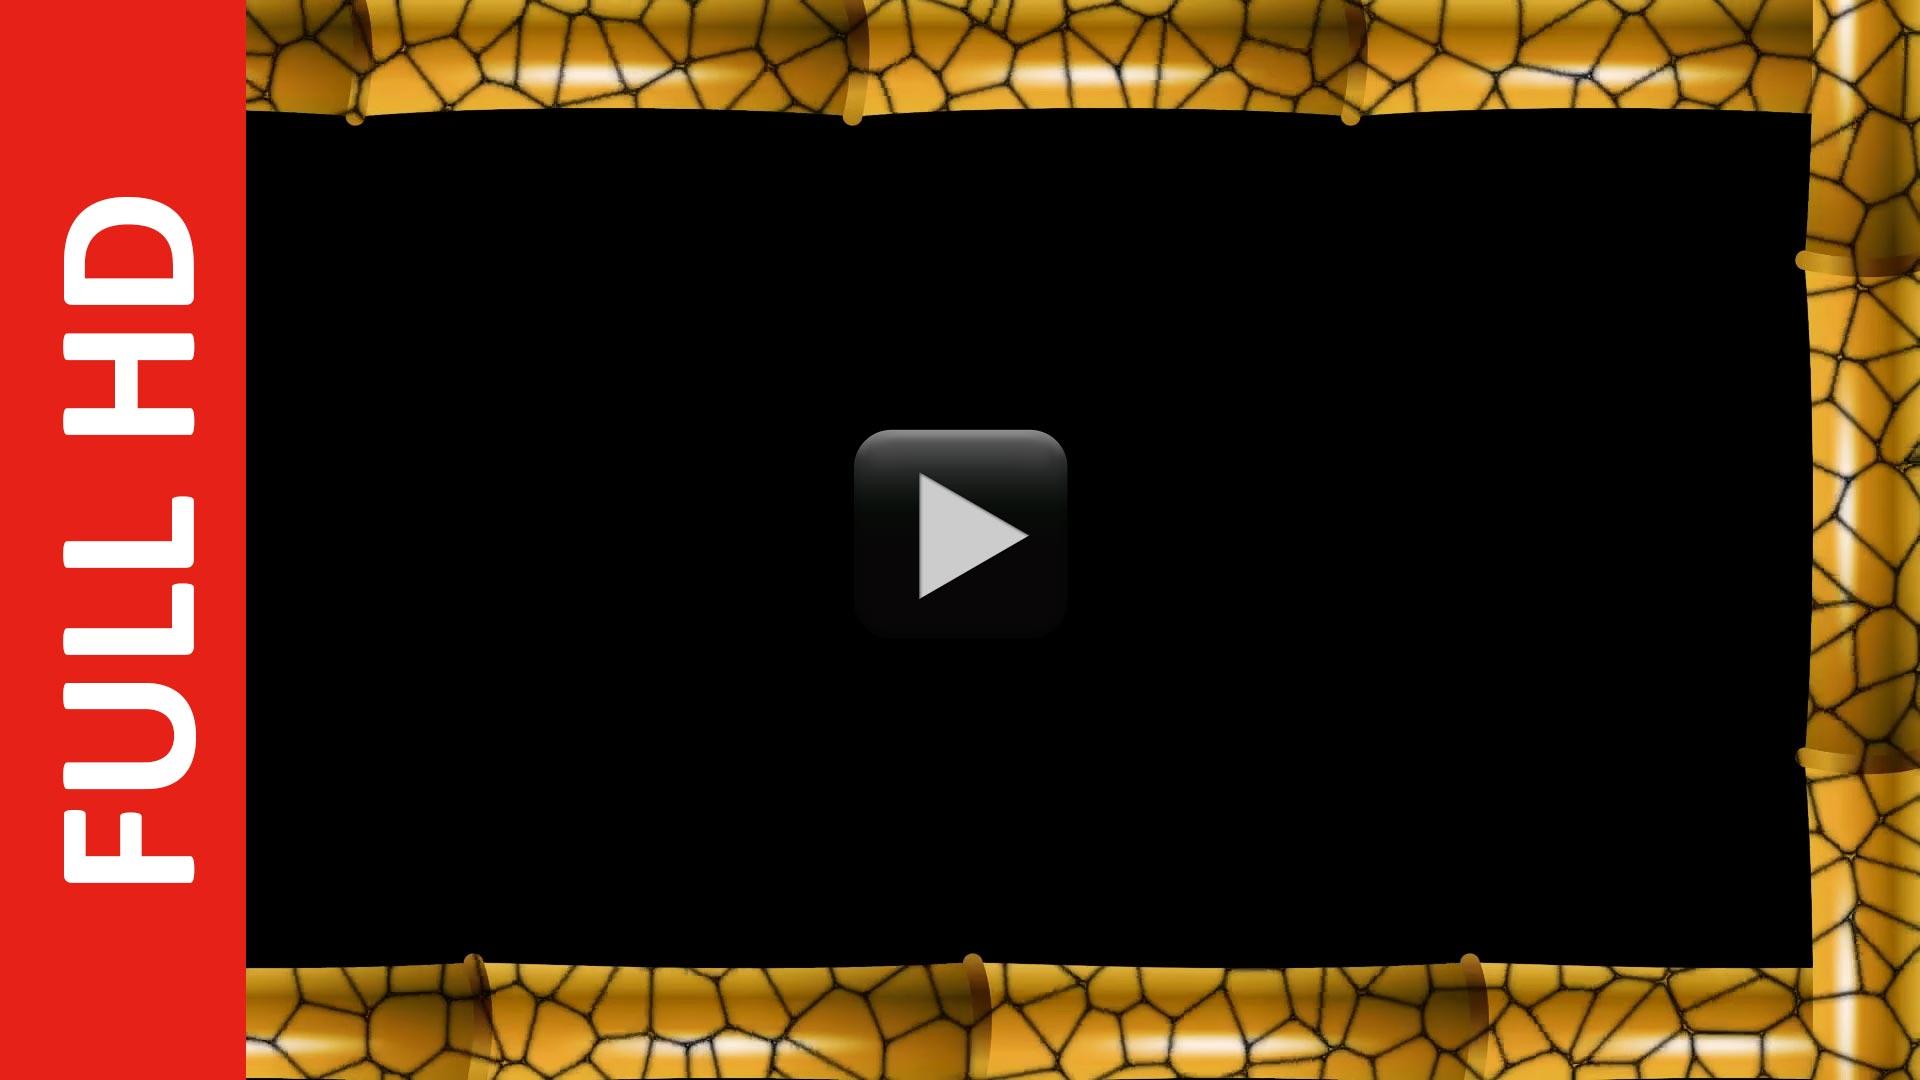 Frame Motion Animation Background